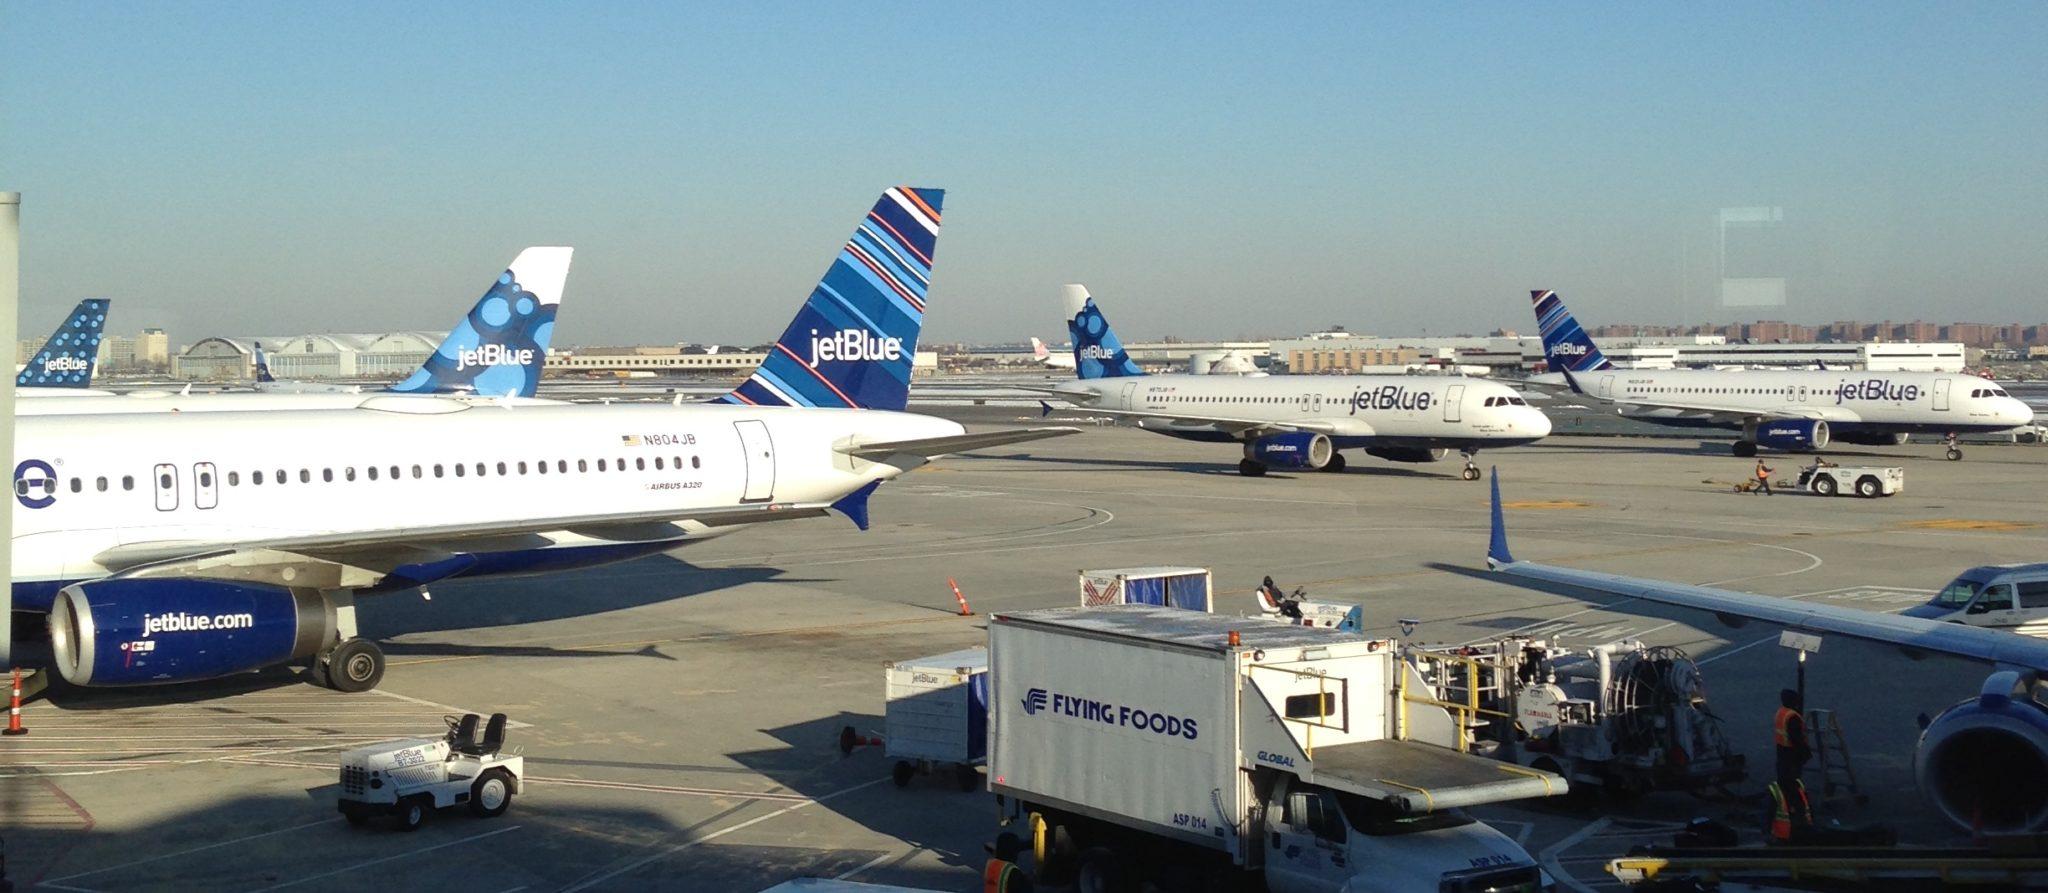 jetBlue network of Caribbean flights will supplement the existing B6 EK connections over JFK. Image: John Walton